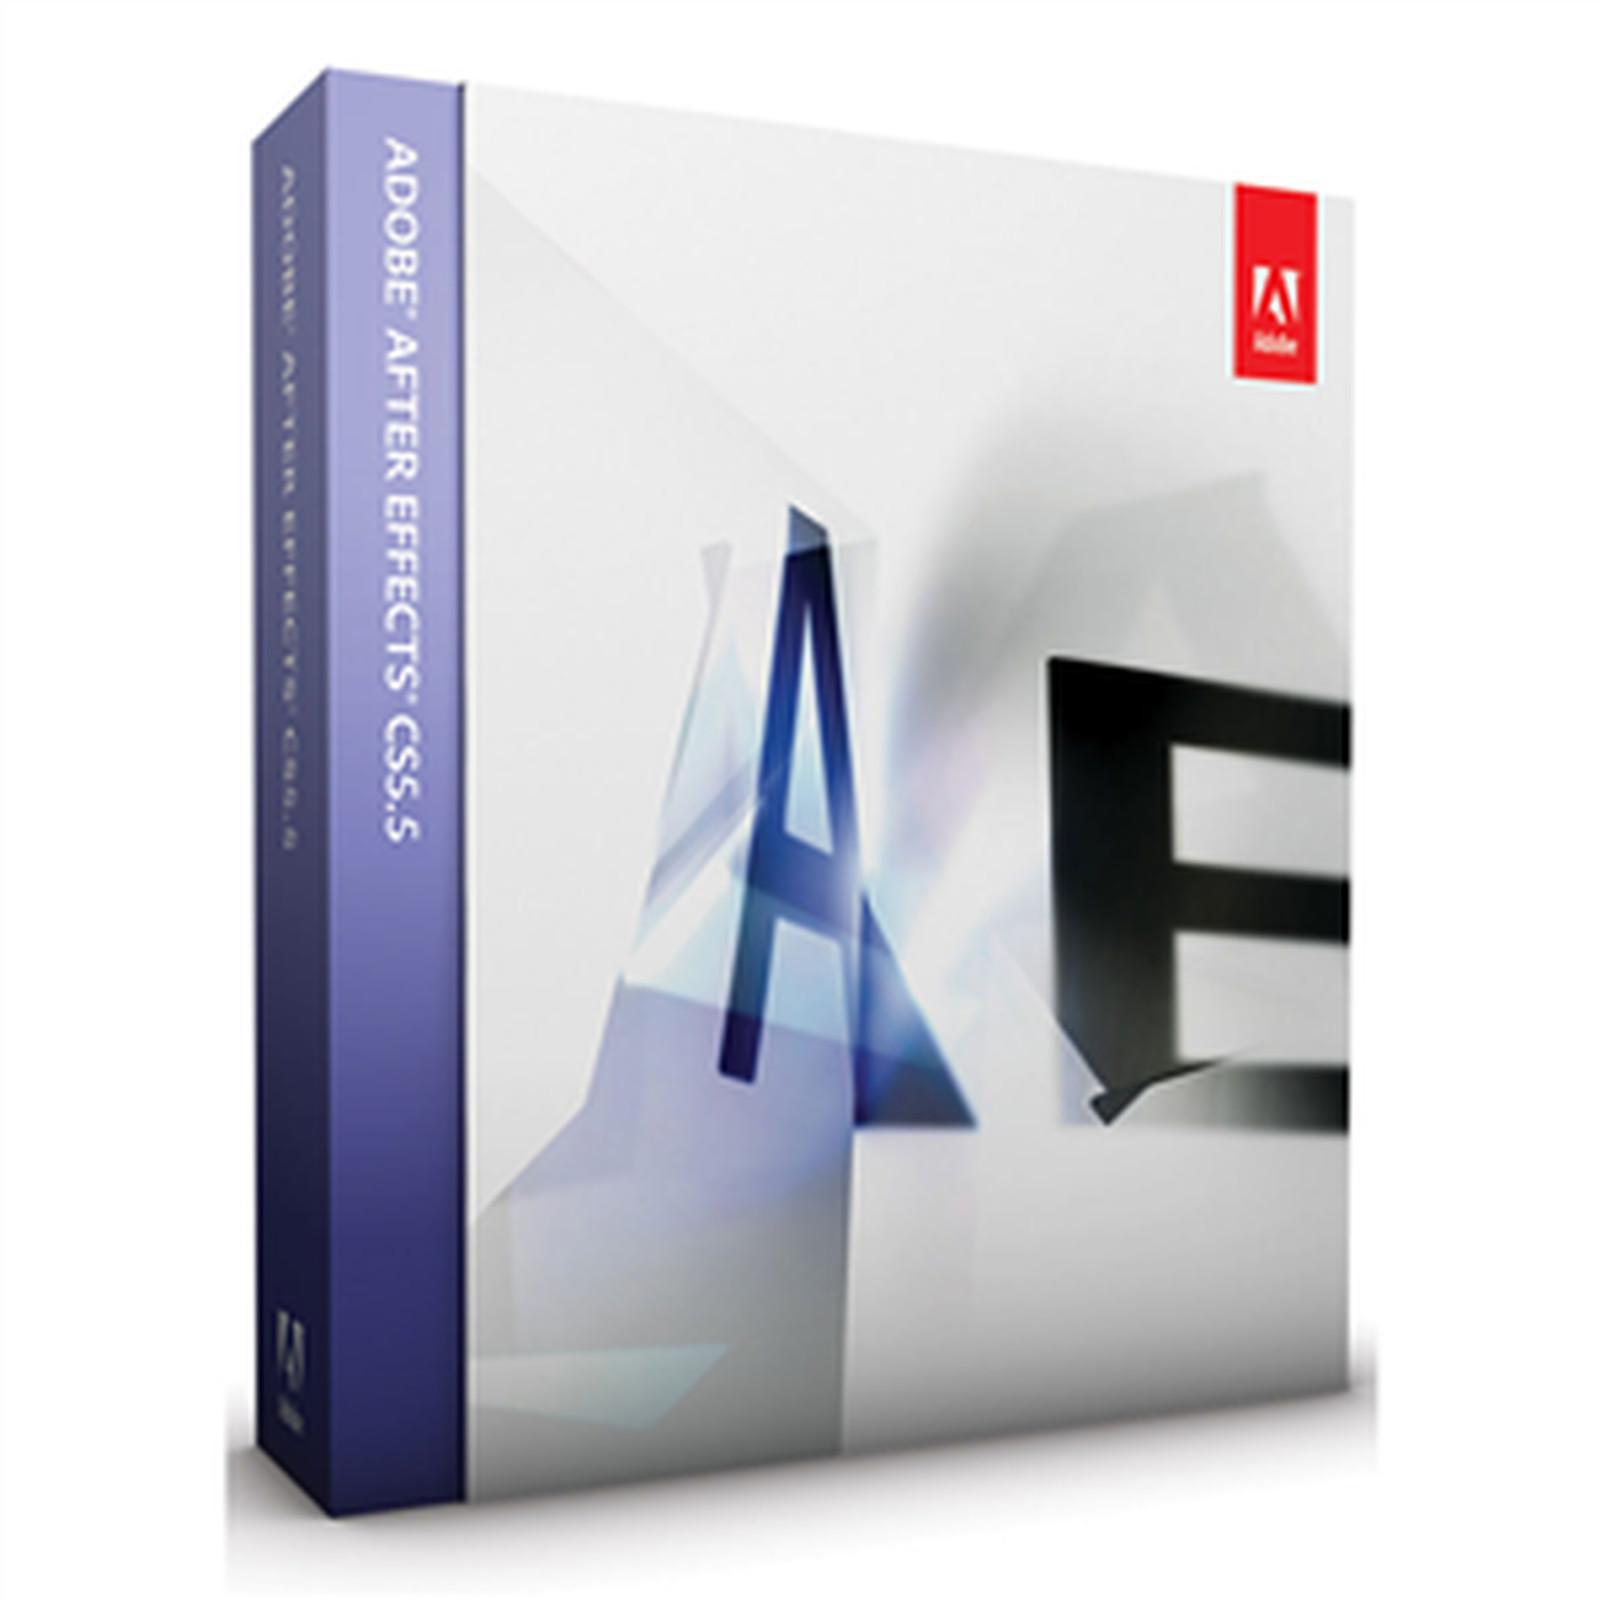 Adobe After Effects CS5.5 Windows